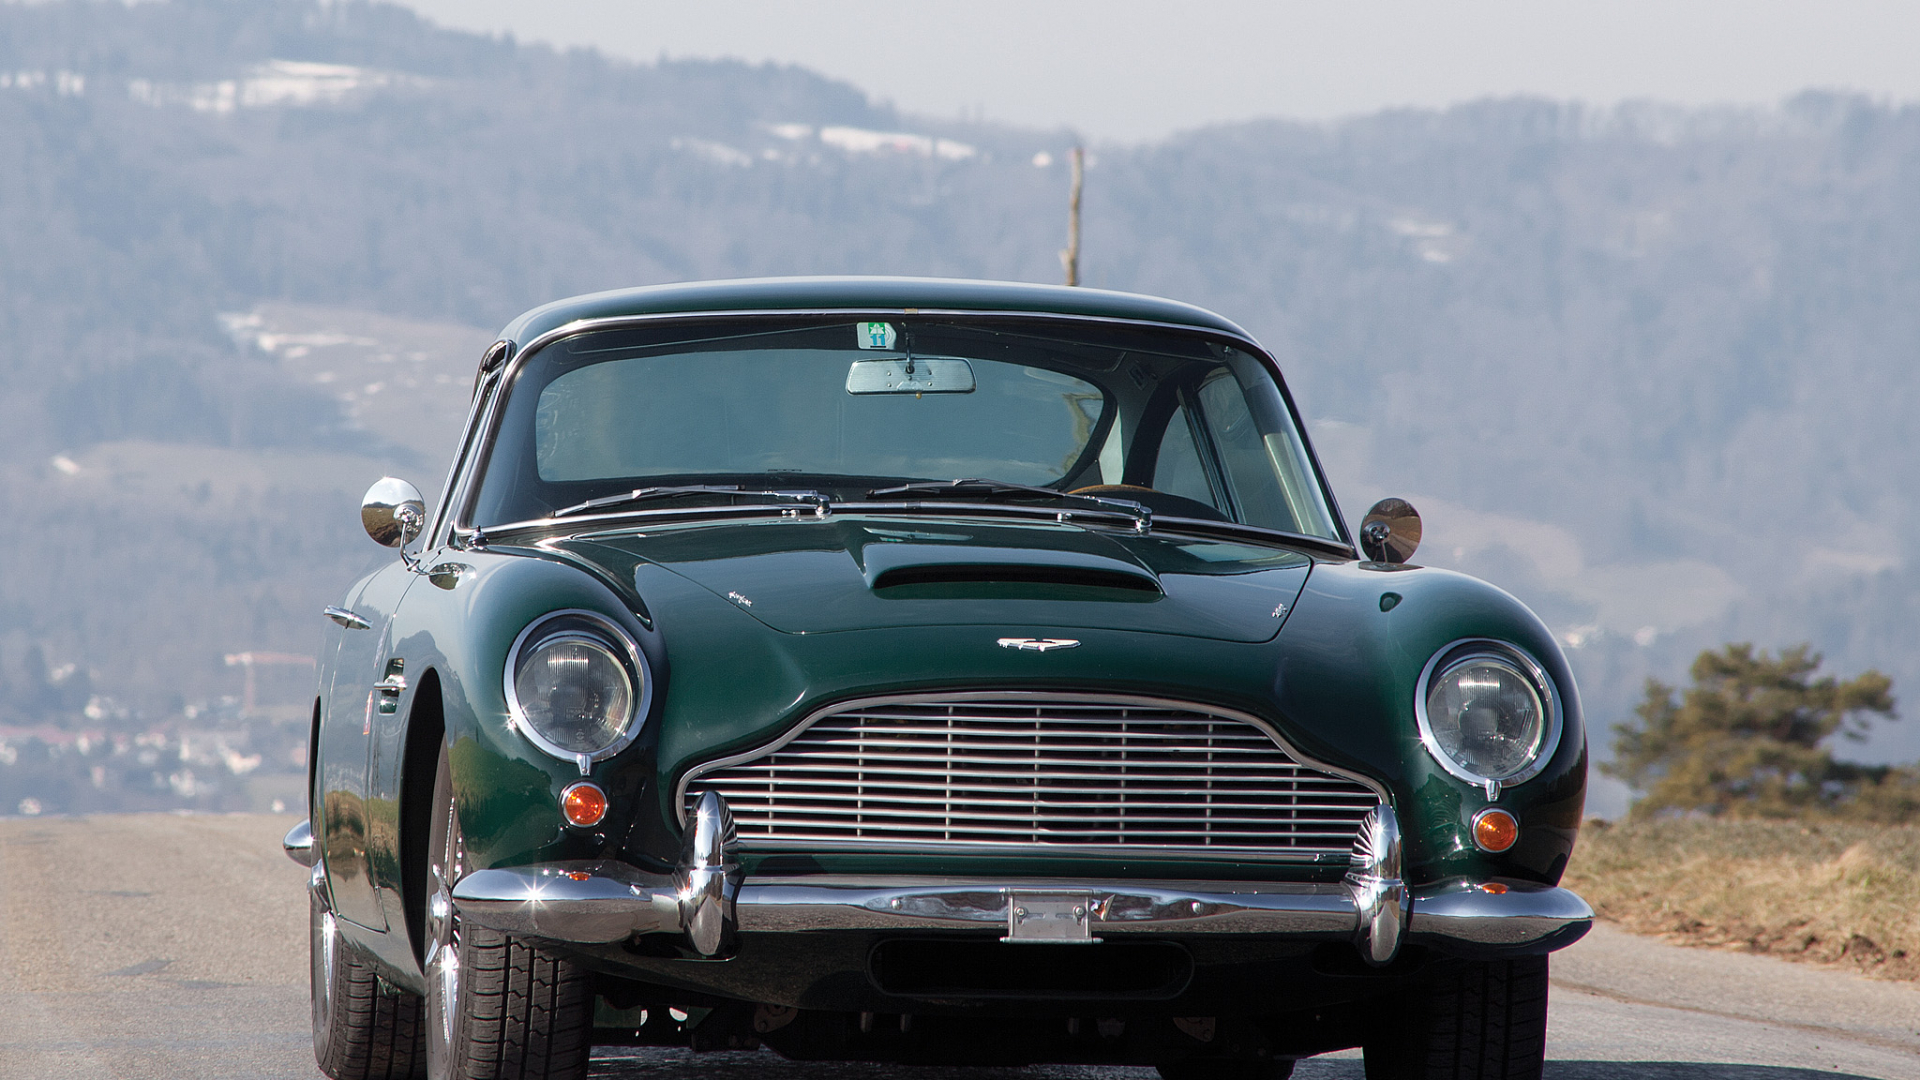 Free Download Aston Martin Db5 Wallpapers Car Wallpapers Hd